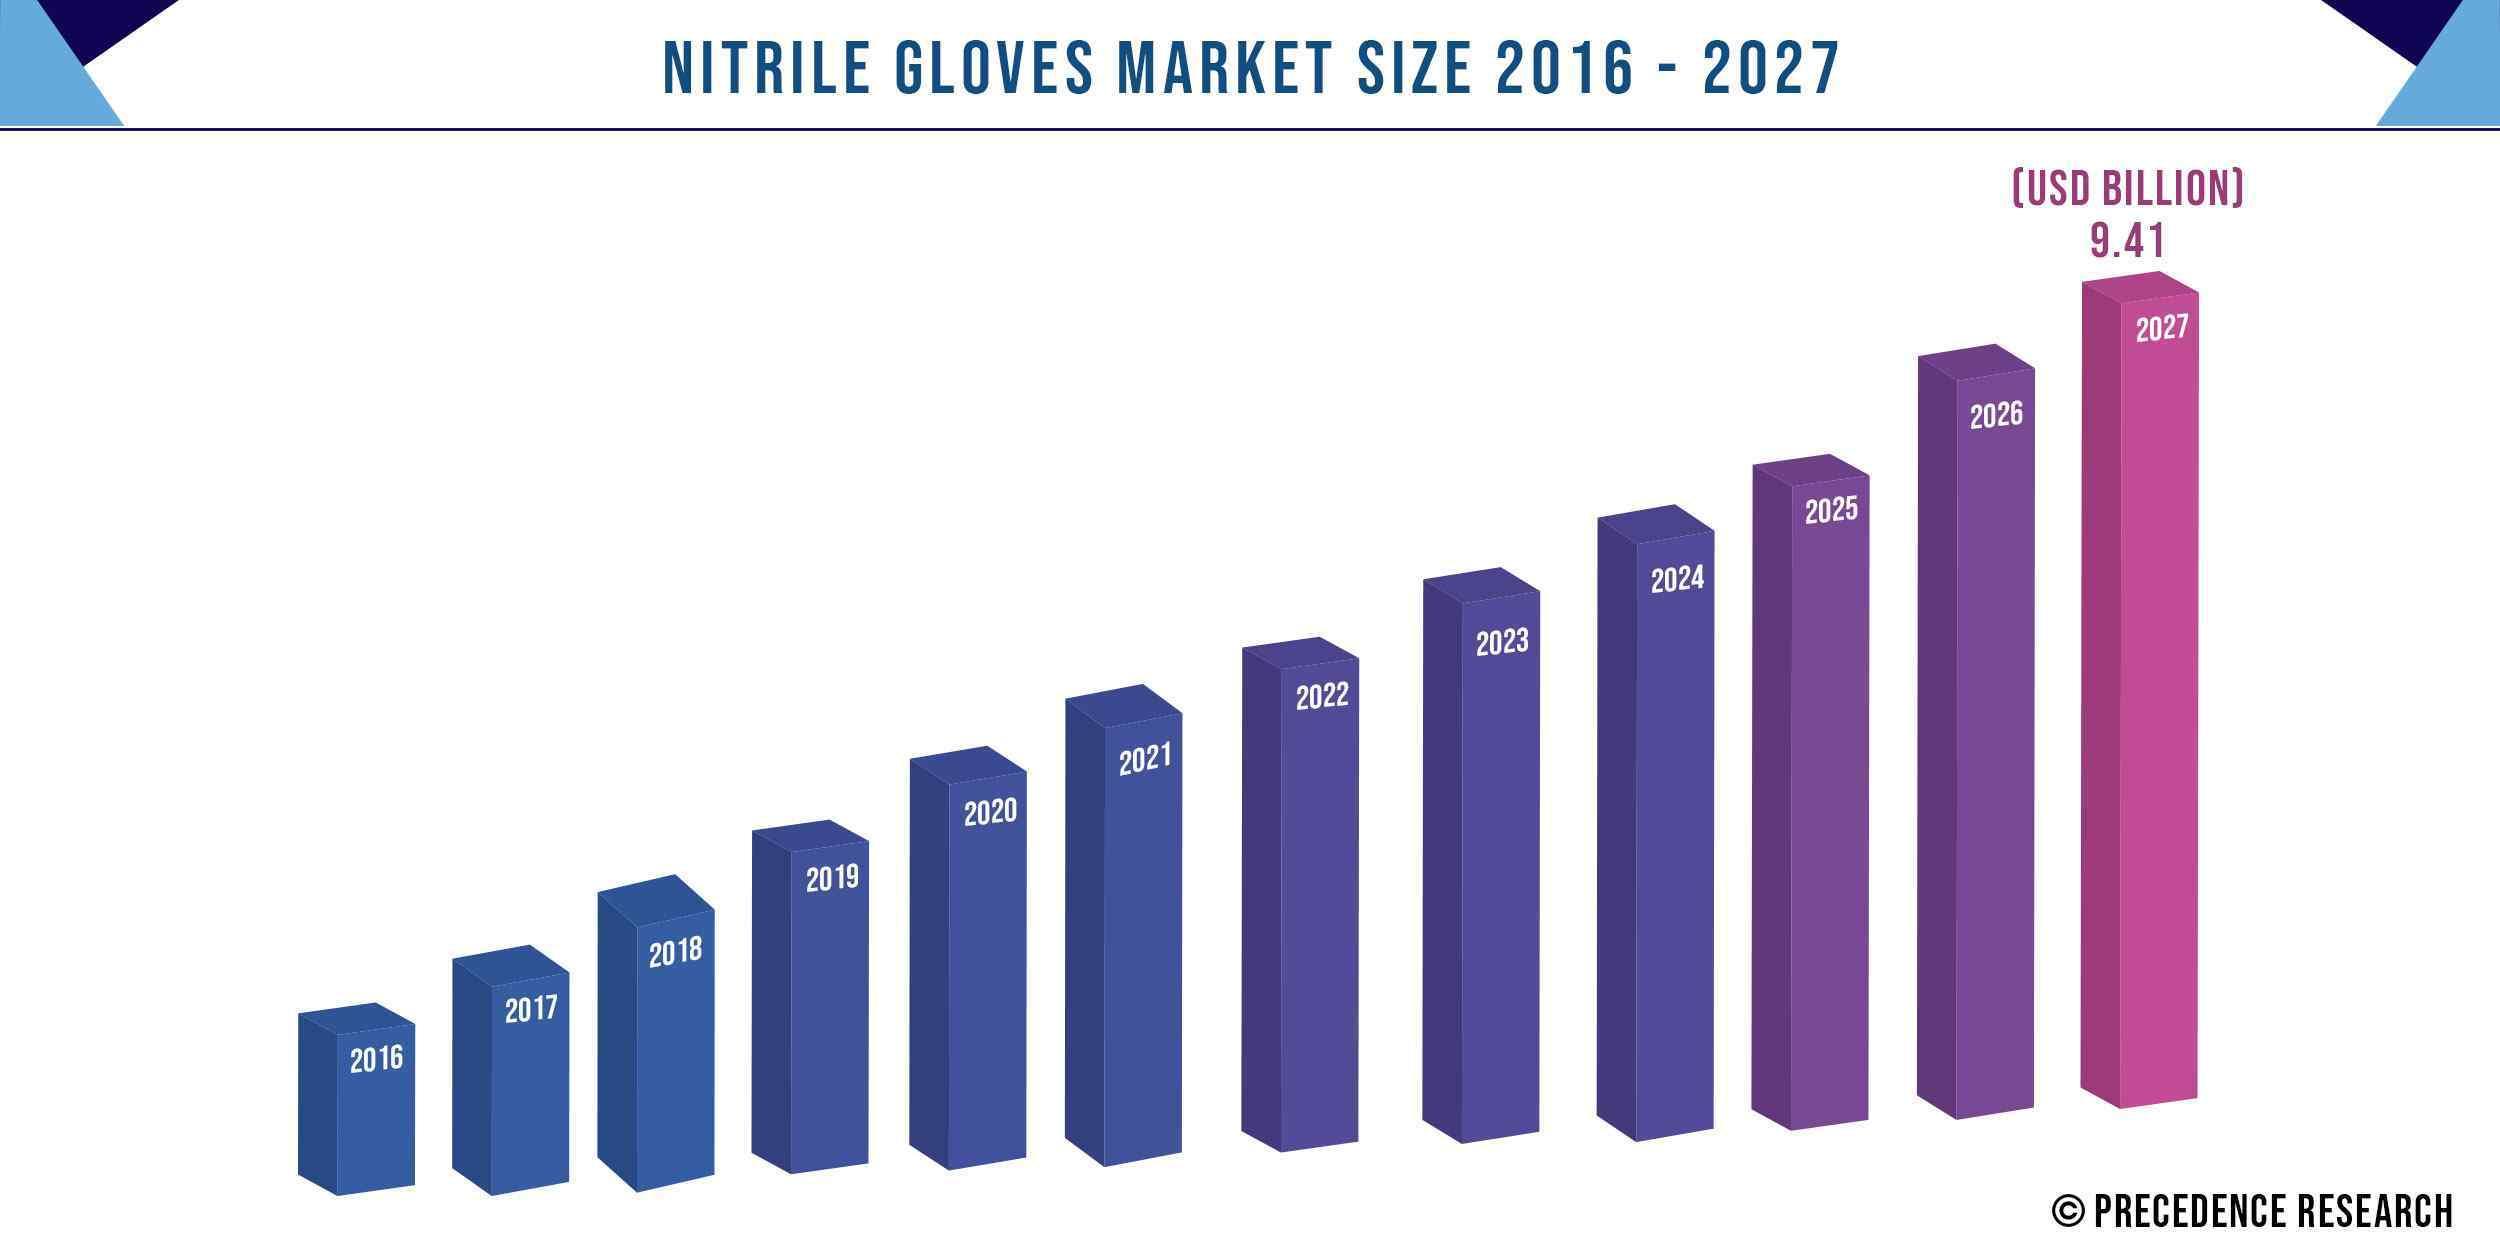 Nitrile Gloves Market Size 2016-2027